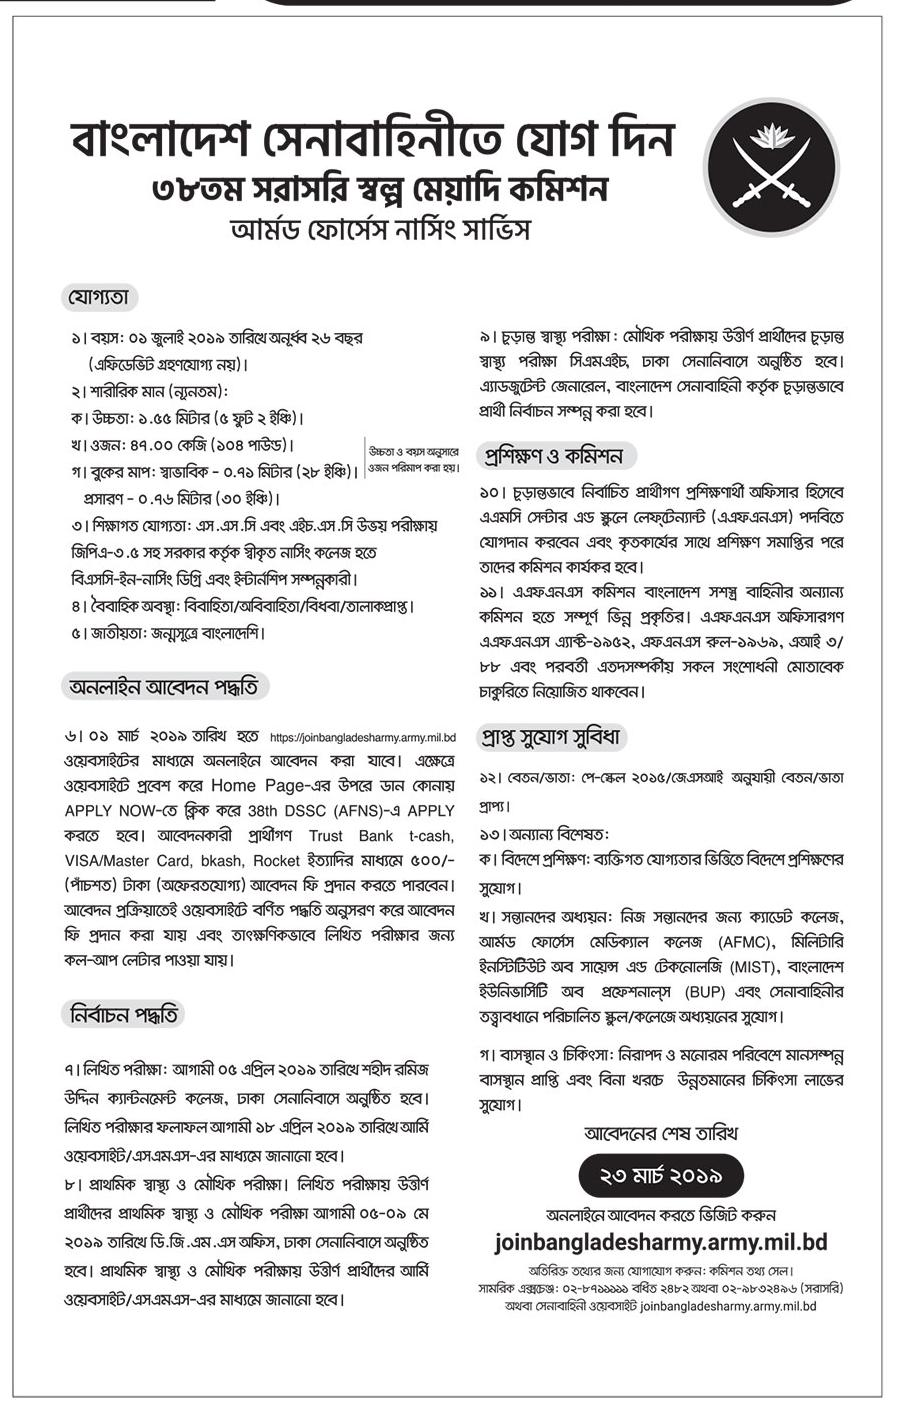 BD Army Job Circular 2019